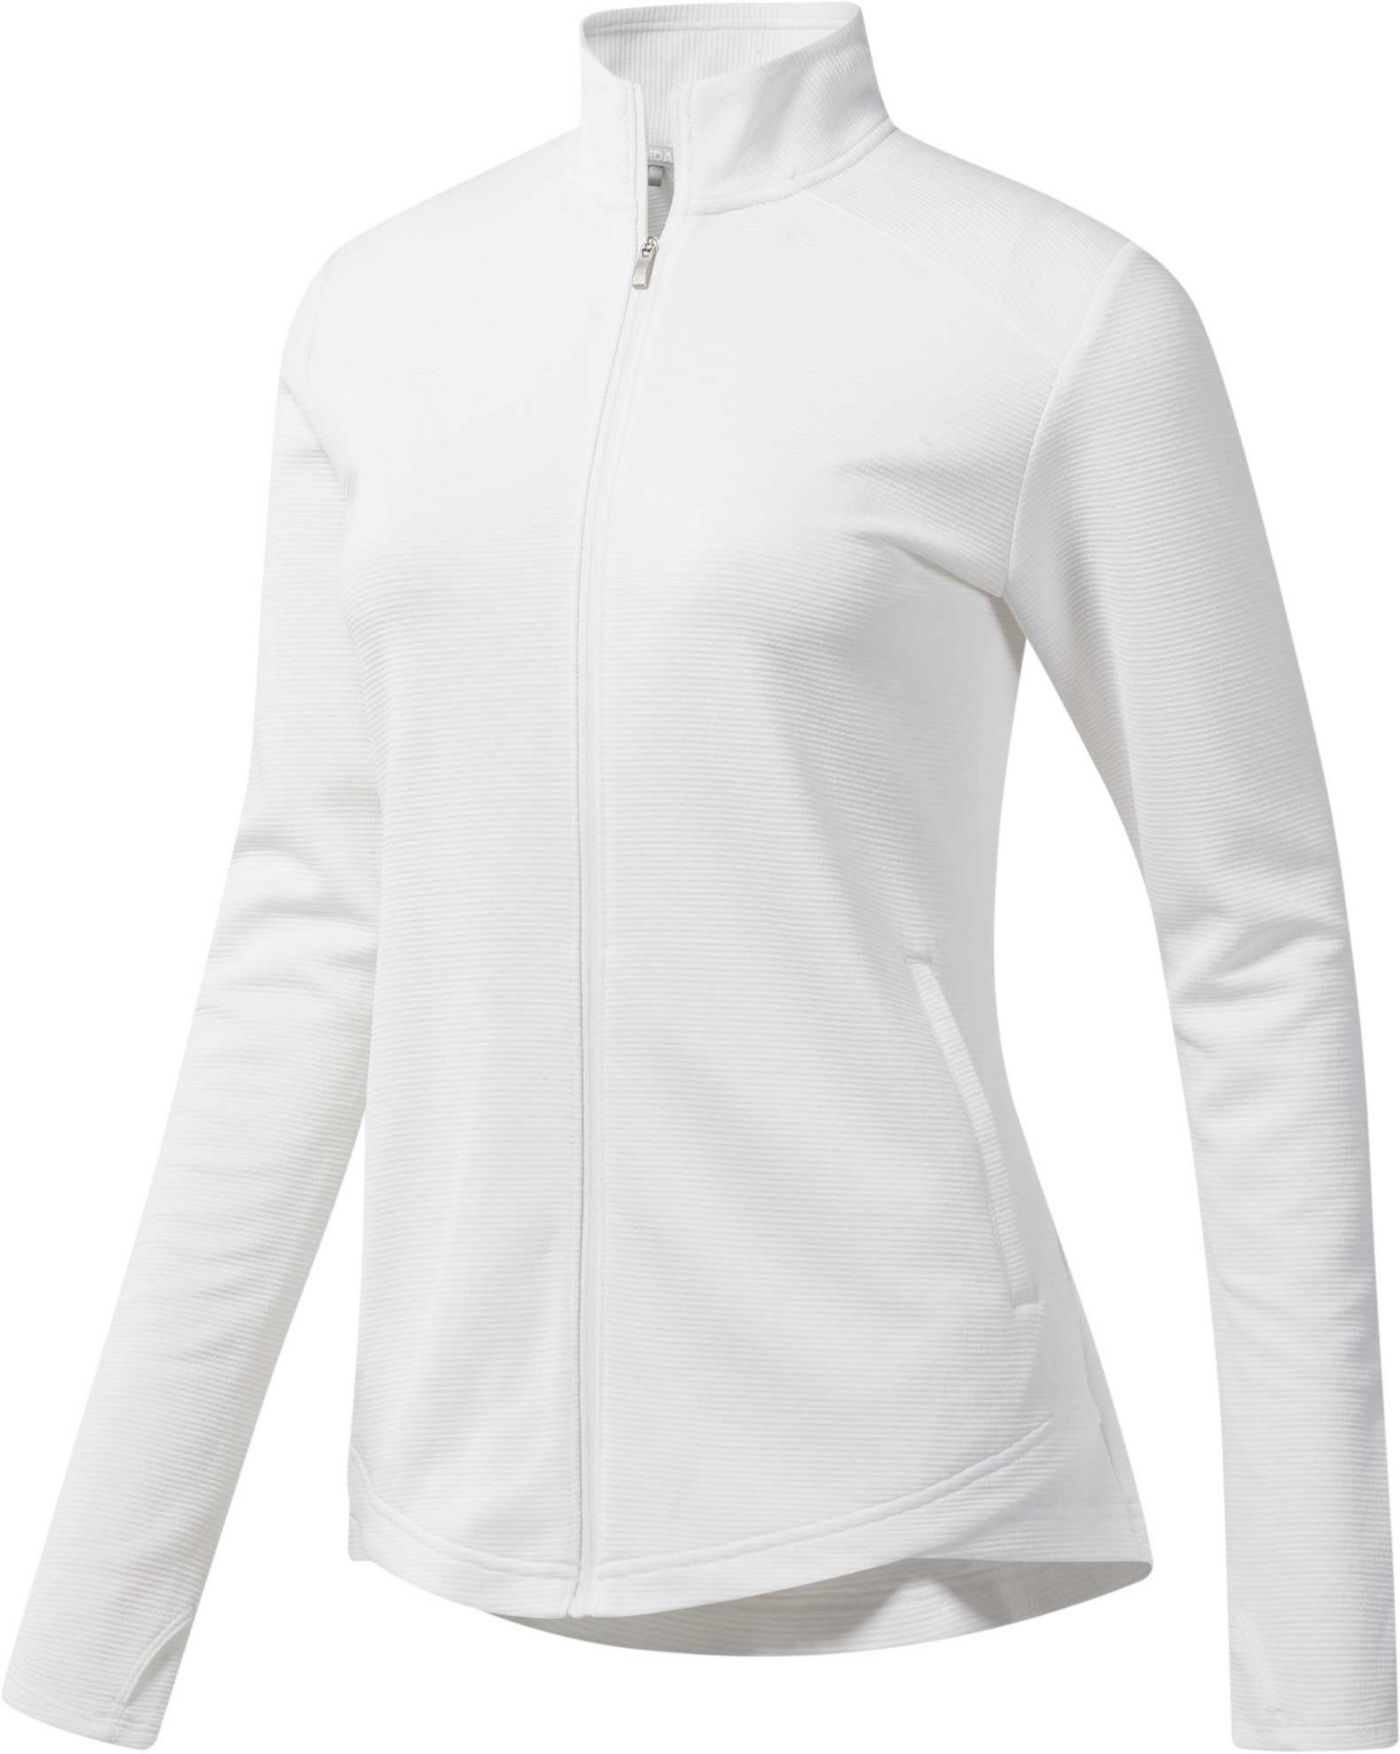 adidas Women's Essentials Full-Zip Golf Jacket